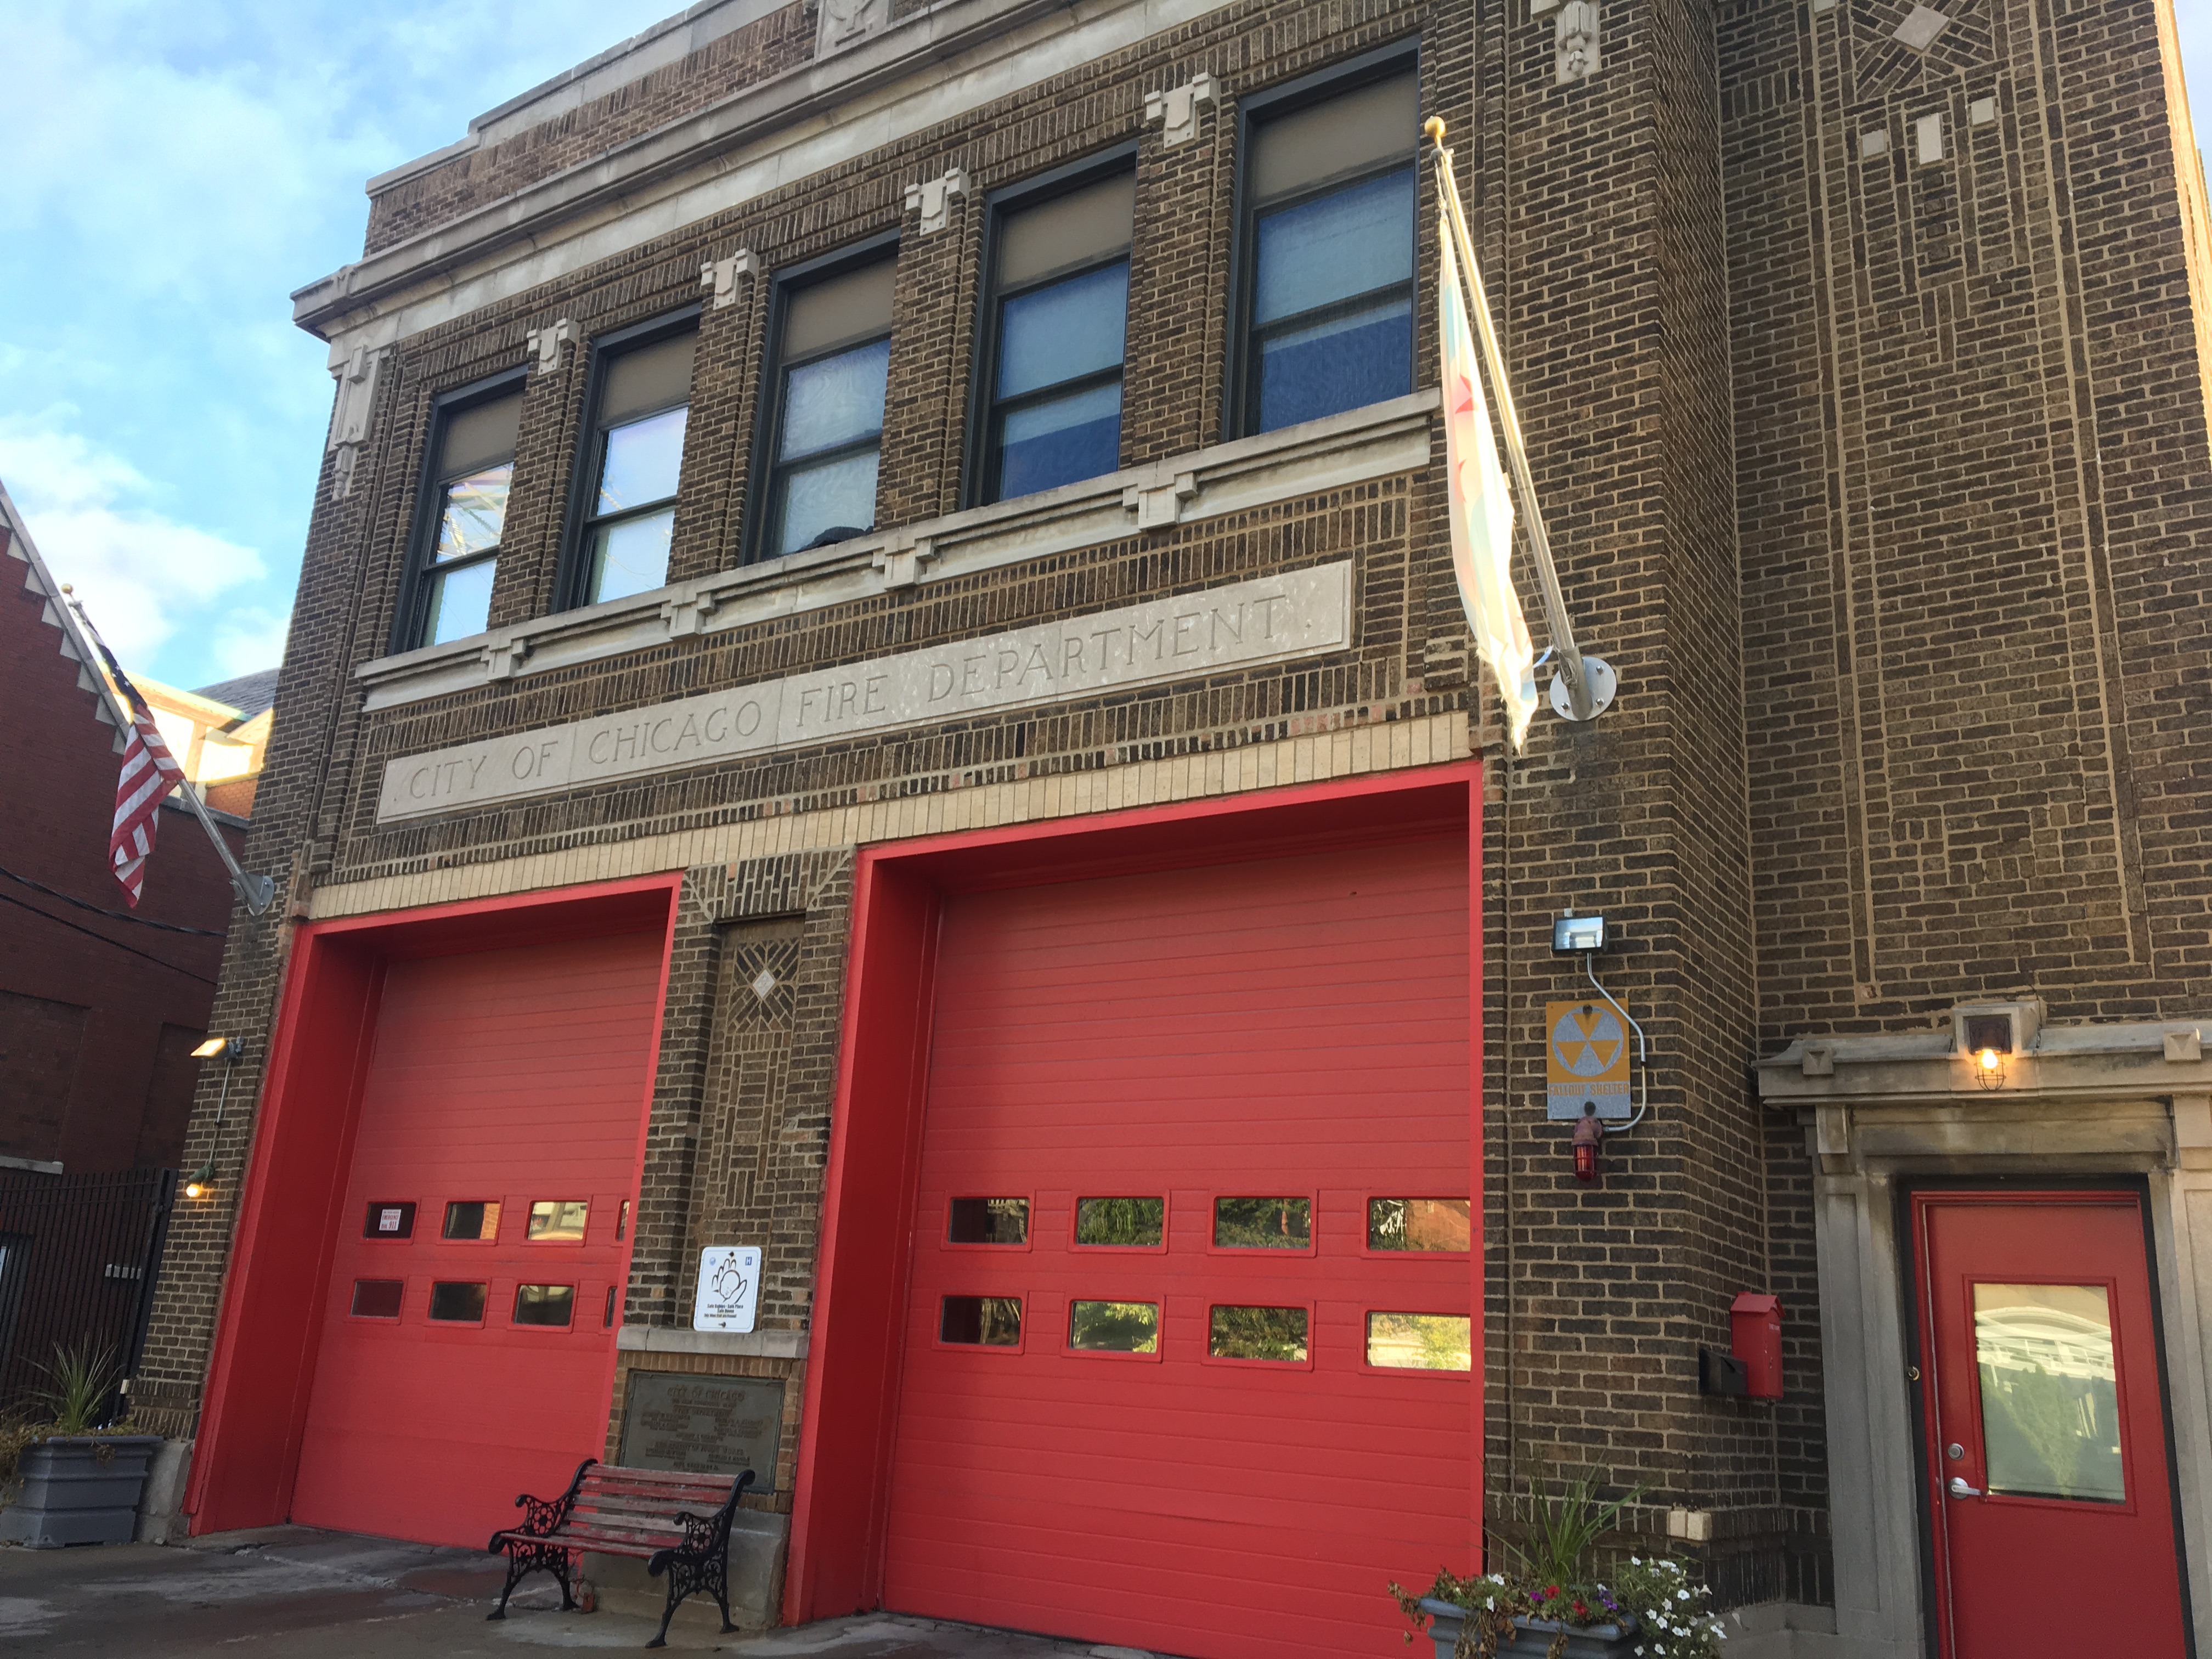 L'Emergency Medical Service de Chicago (Illinois)